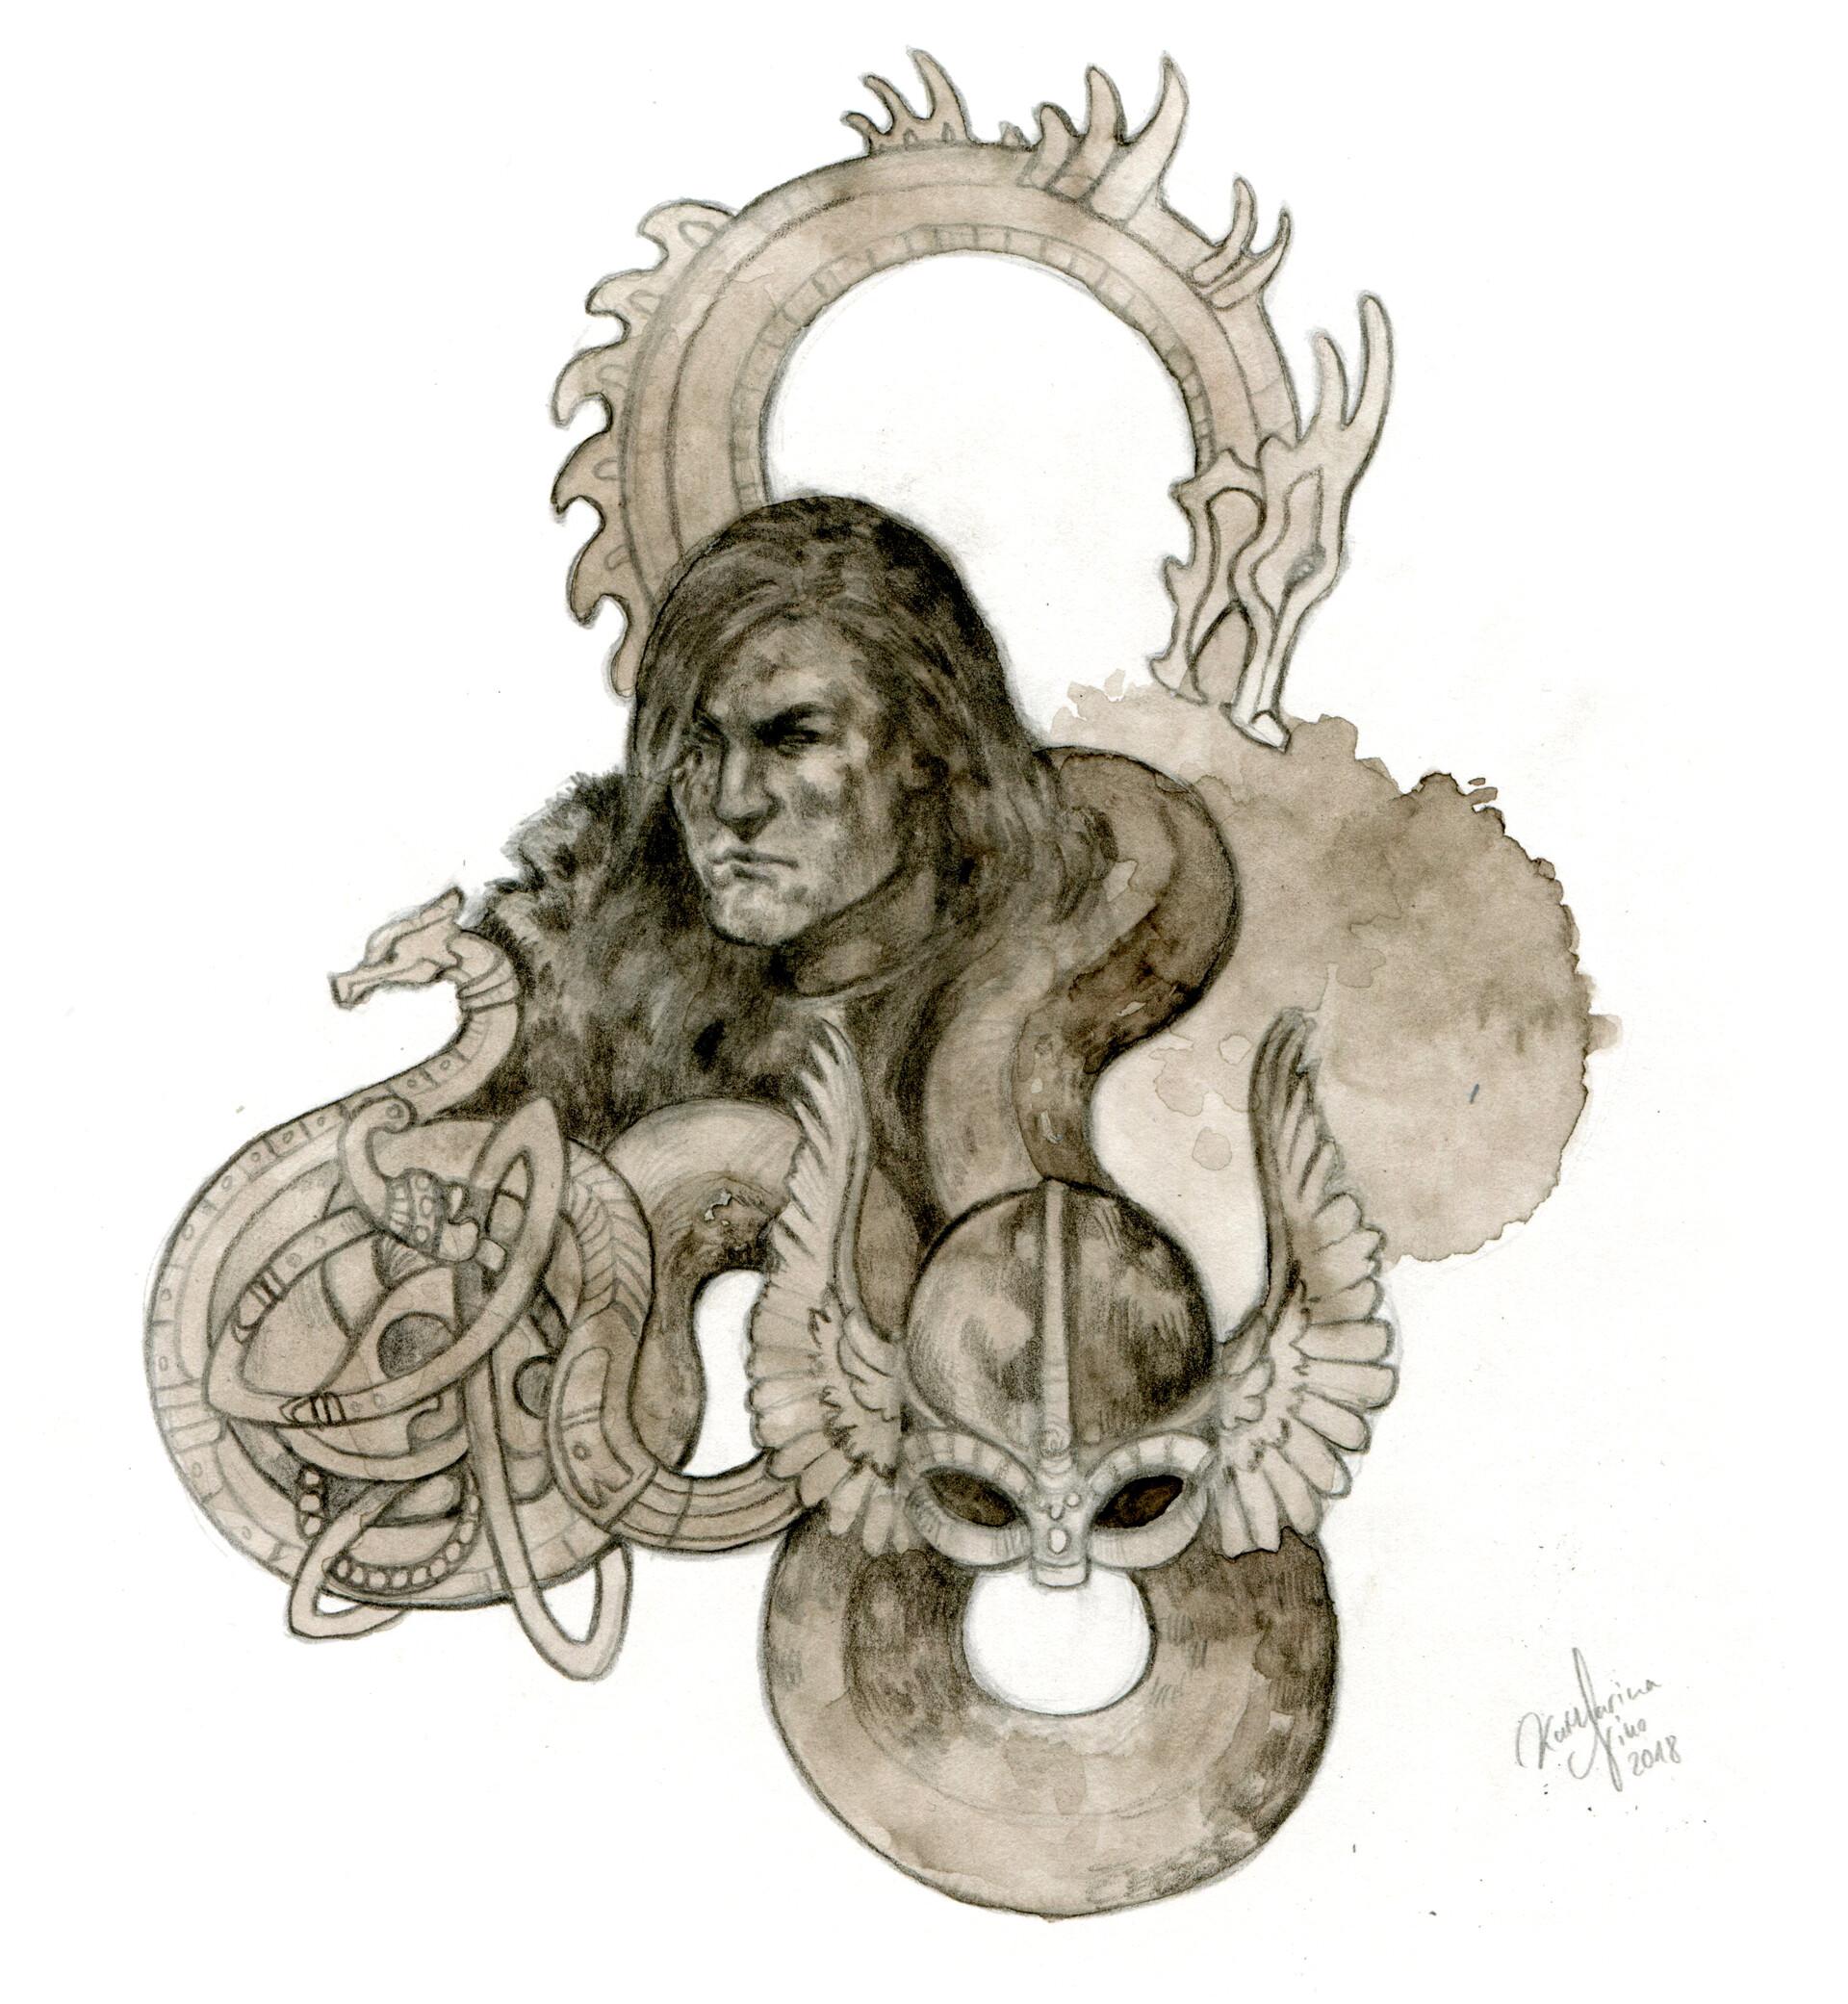 Vignette of Beorn